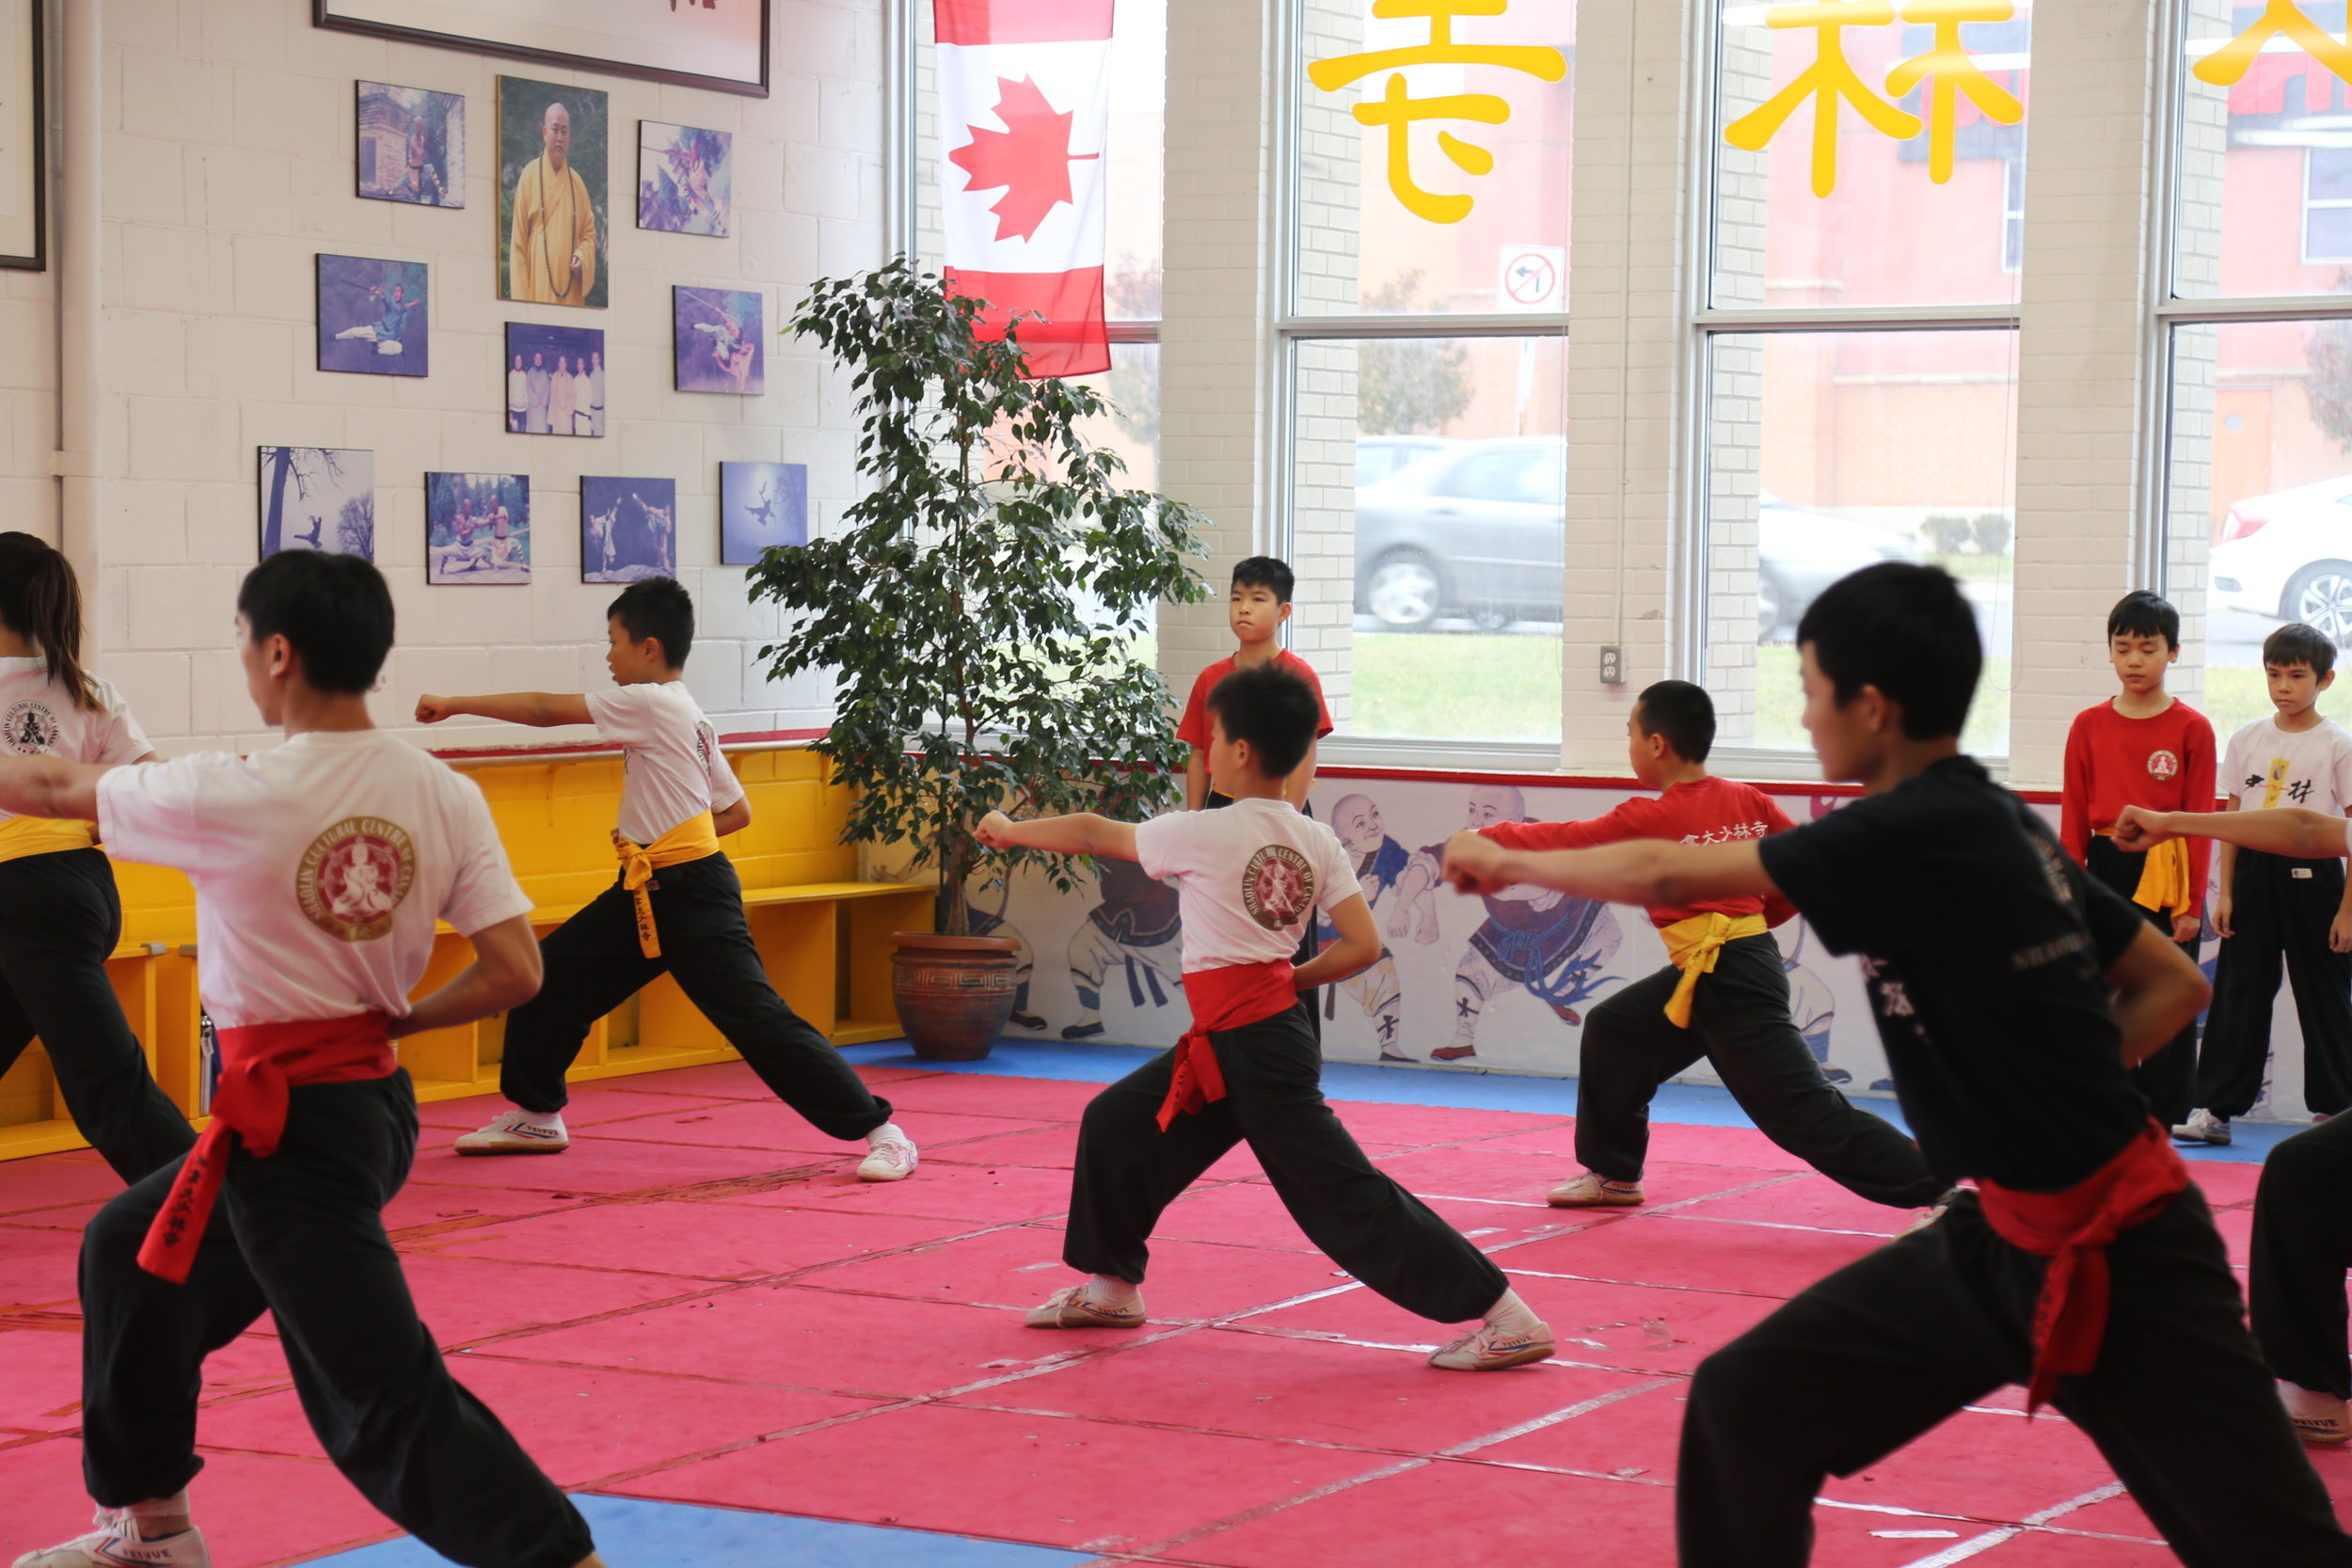 Shaolin Cultural Centre of Canada